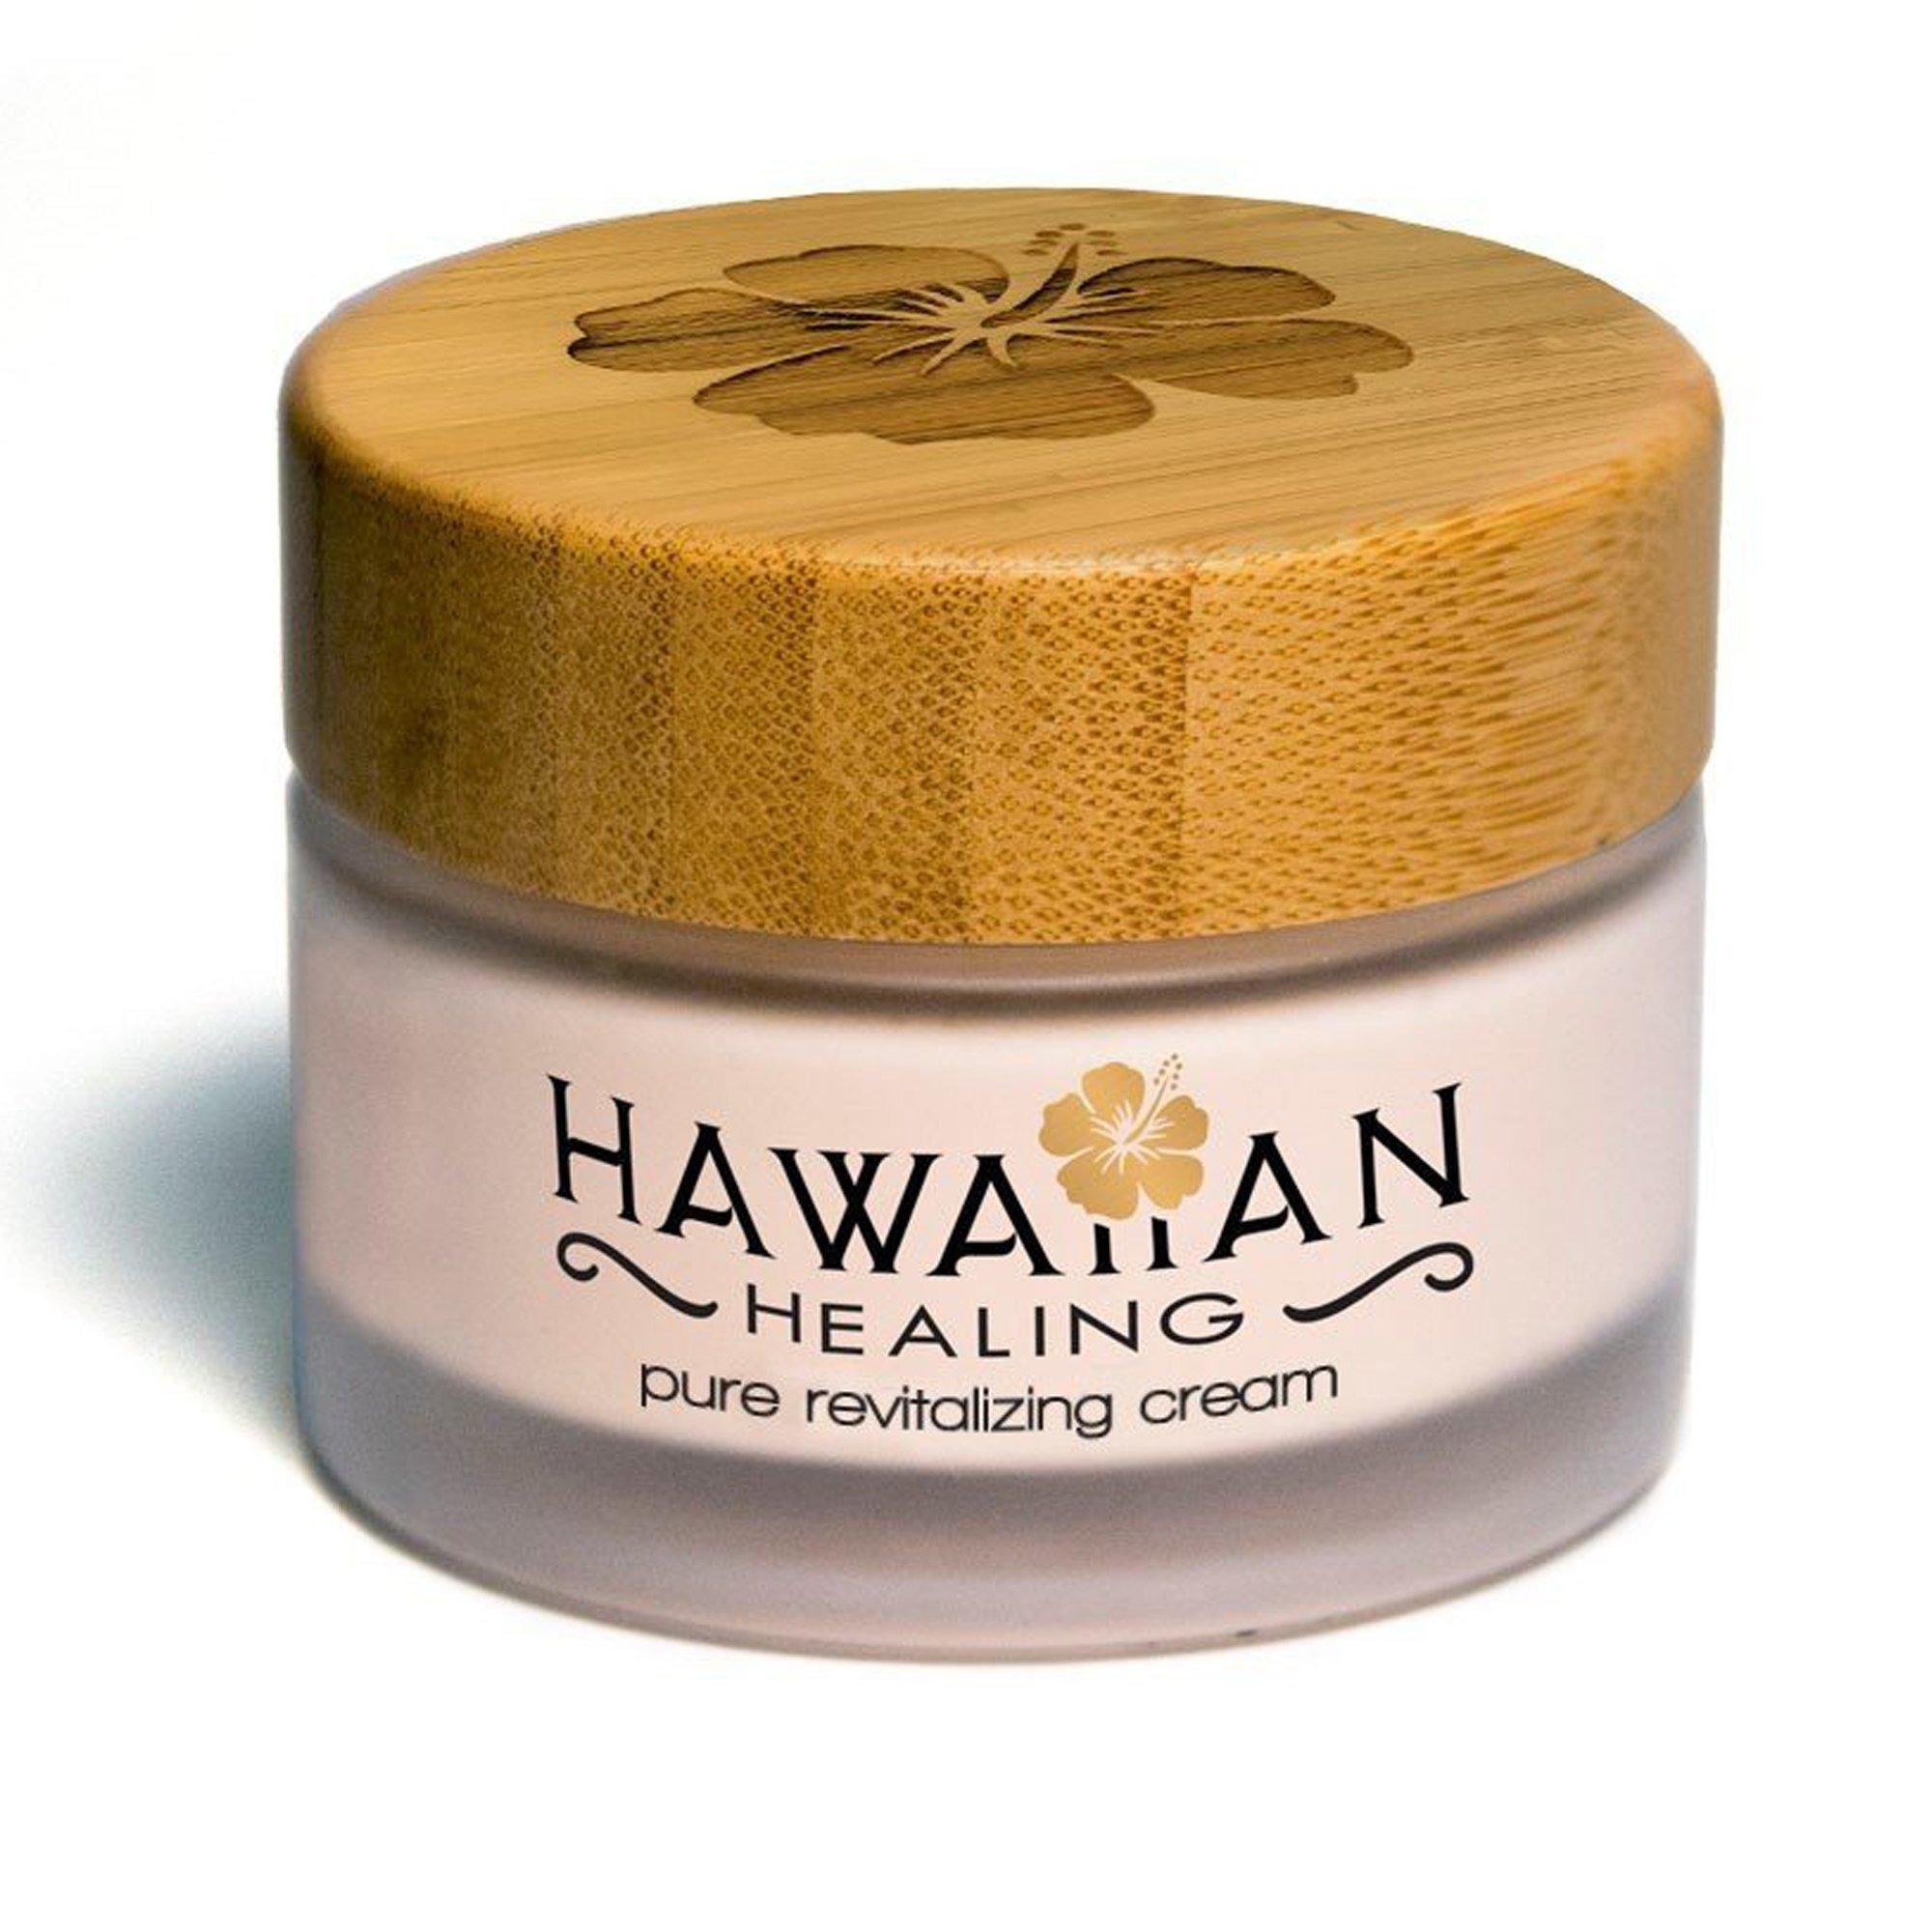 Hawaiian Healing Skin Care Anti-Aging & Hydrating Face Cream with Organic Hawaiian Macadamia Flower Honey and Hawaiian Astaxanthin to Reduce Appearance of Wrinkles & Fine Lines (50g) by Hawaiian Healing